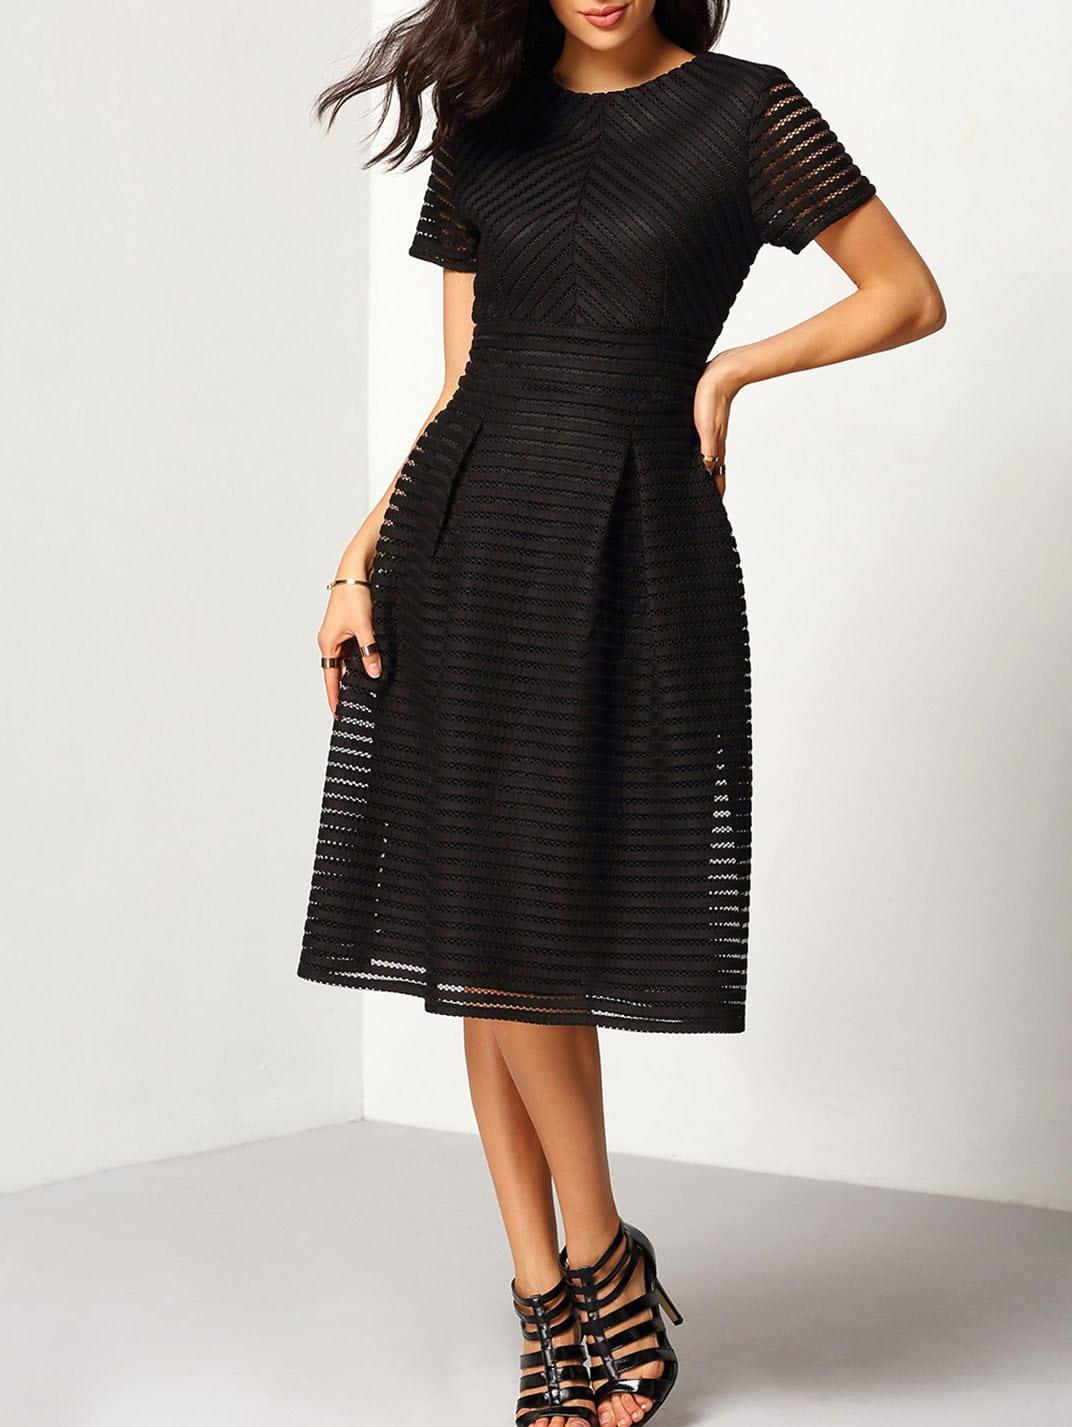 Short Sleeve Hollow Out Flippy Dress